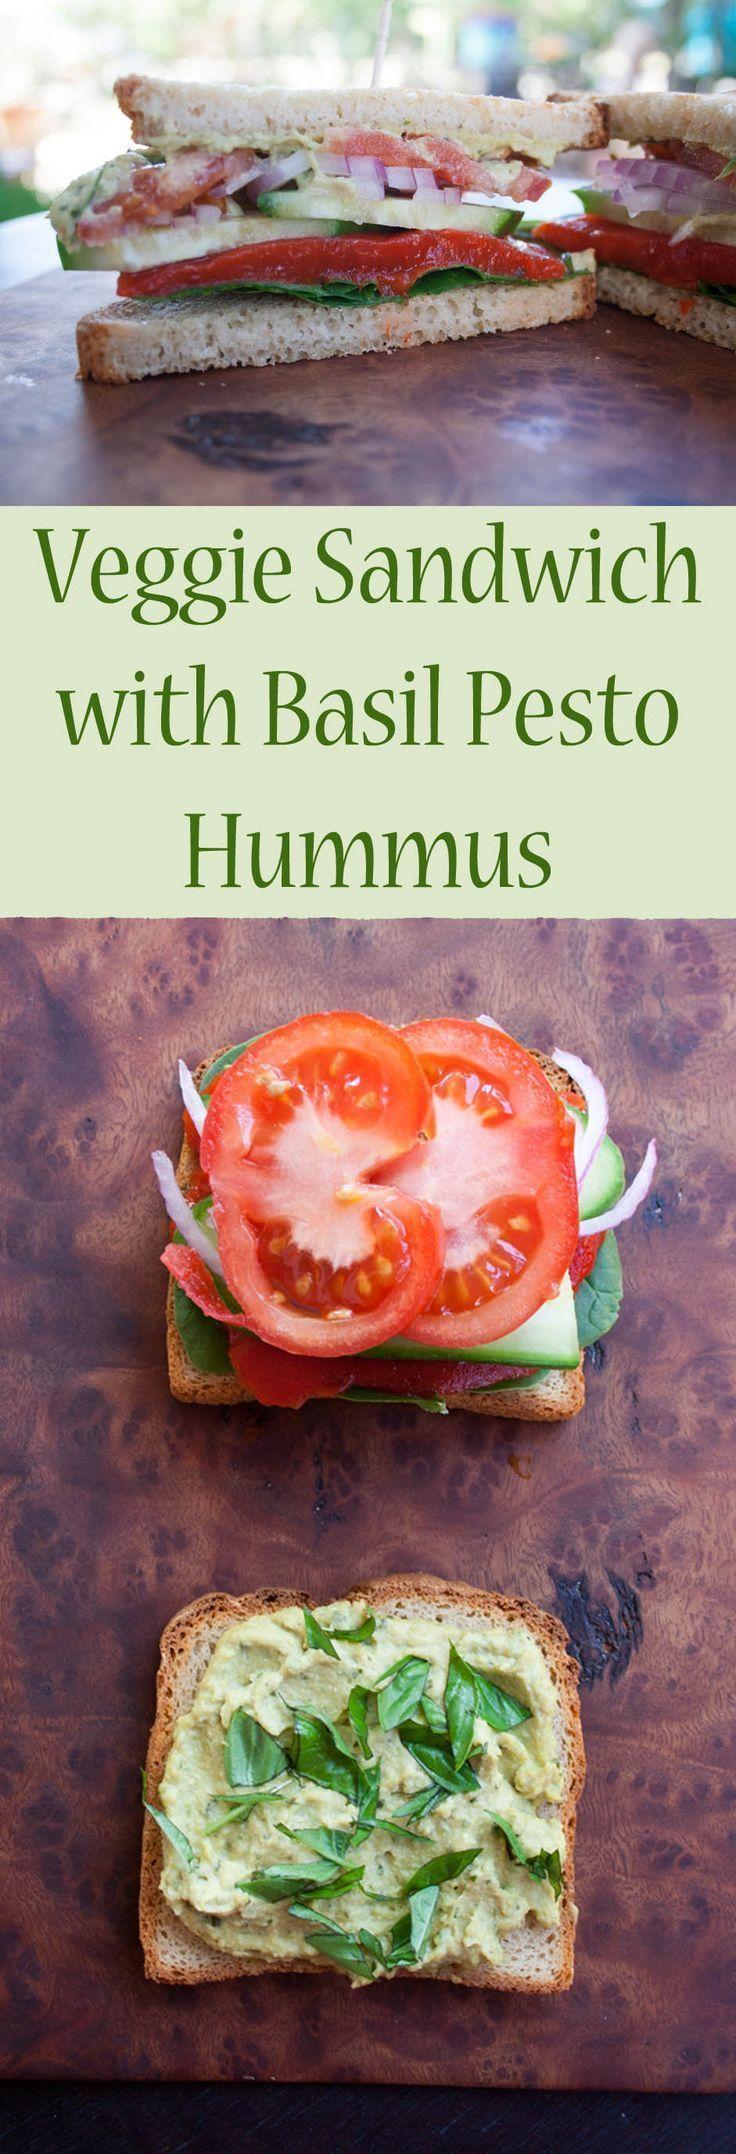 Veggie Sandwich with Basil Pesto Hummus (vegan, gluten free) – This savory sandw…